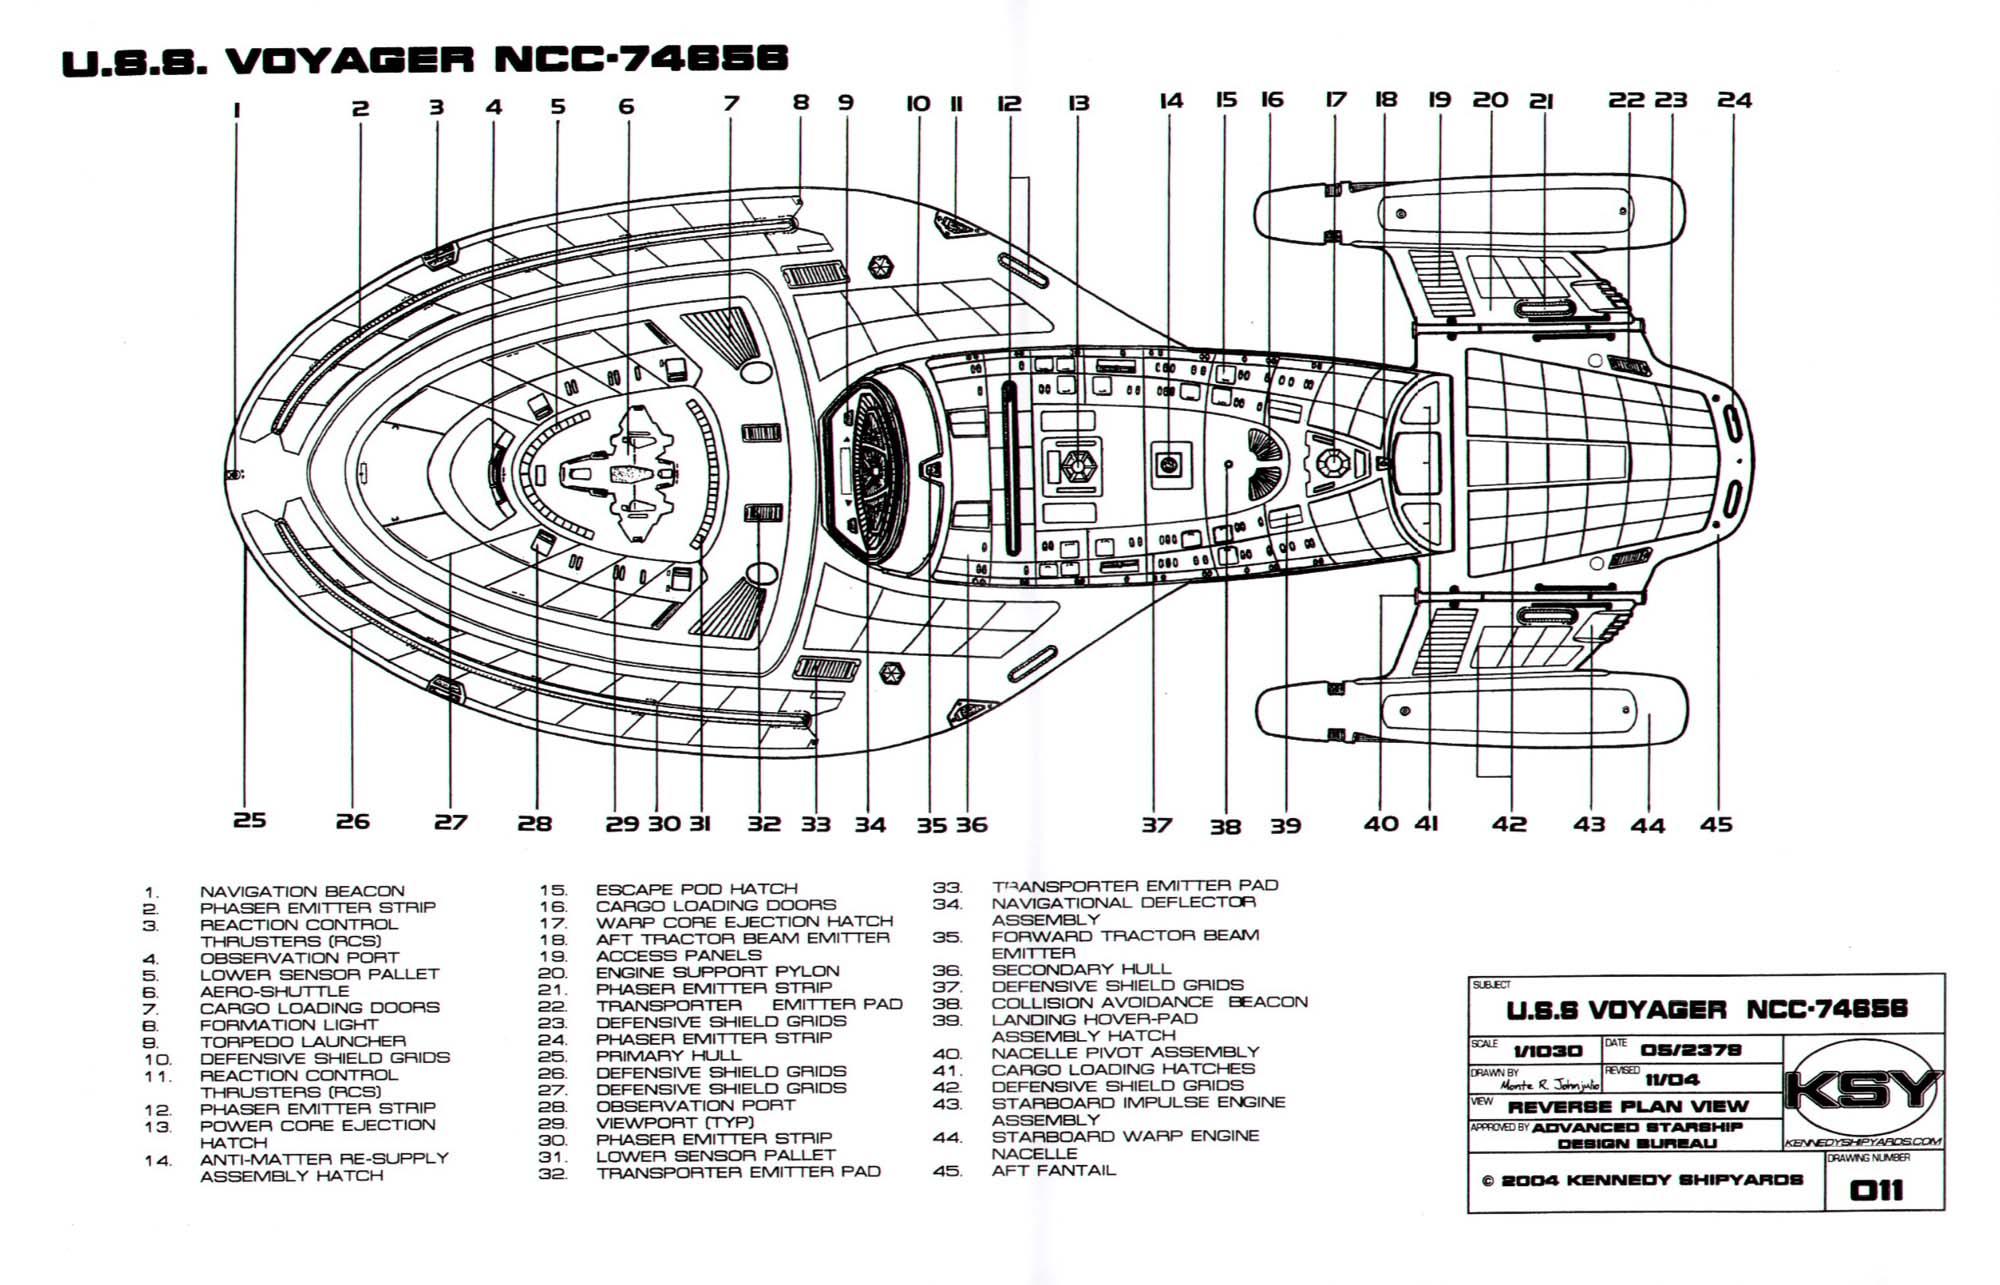 Star Trek Blueprints Intrepid Class Starship U S S